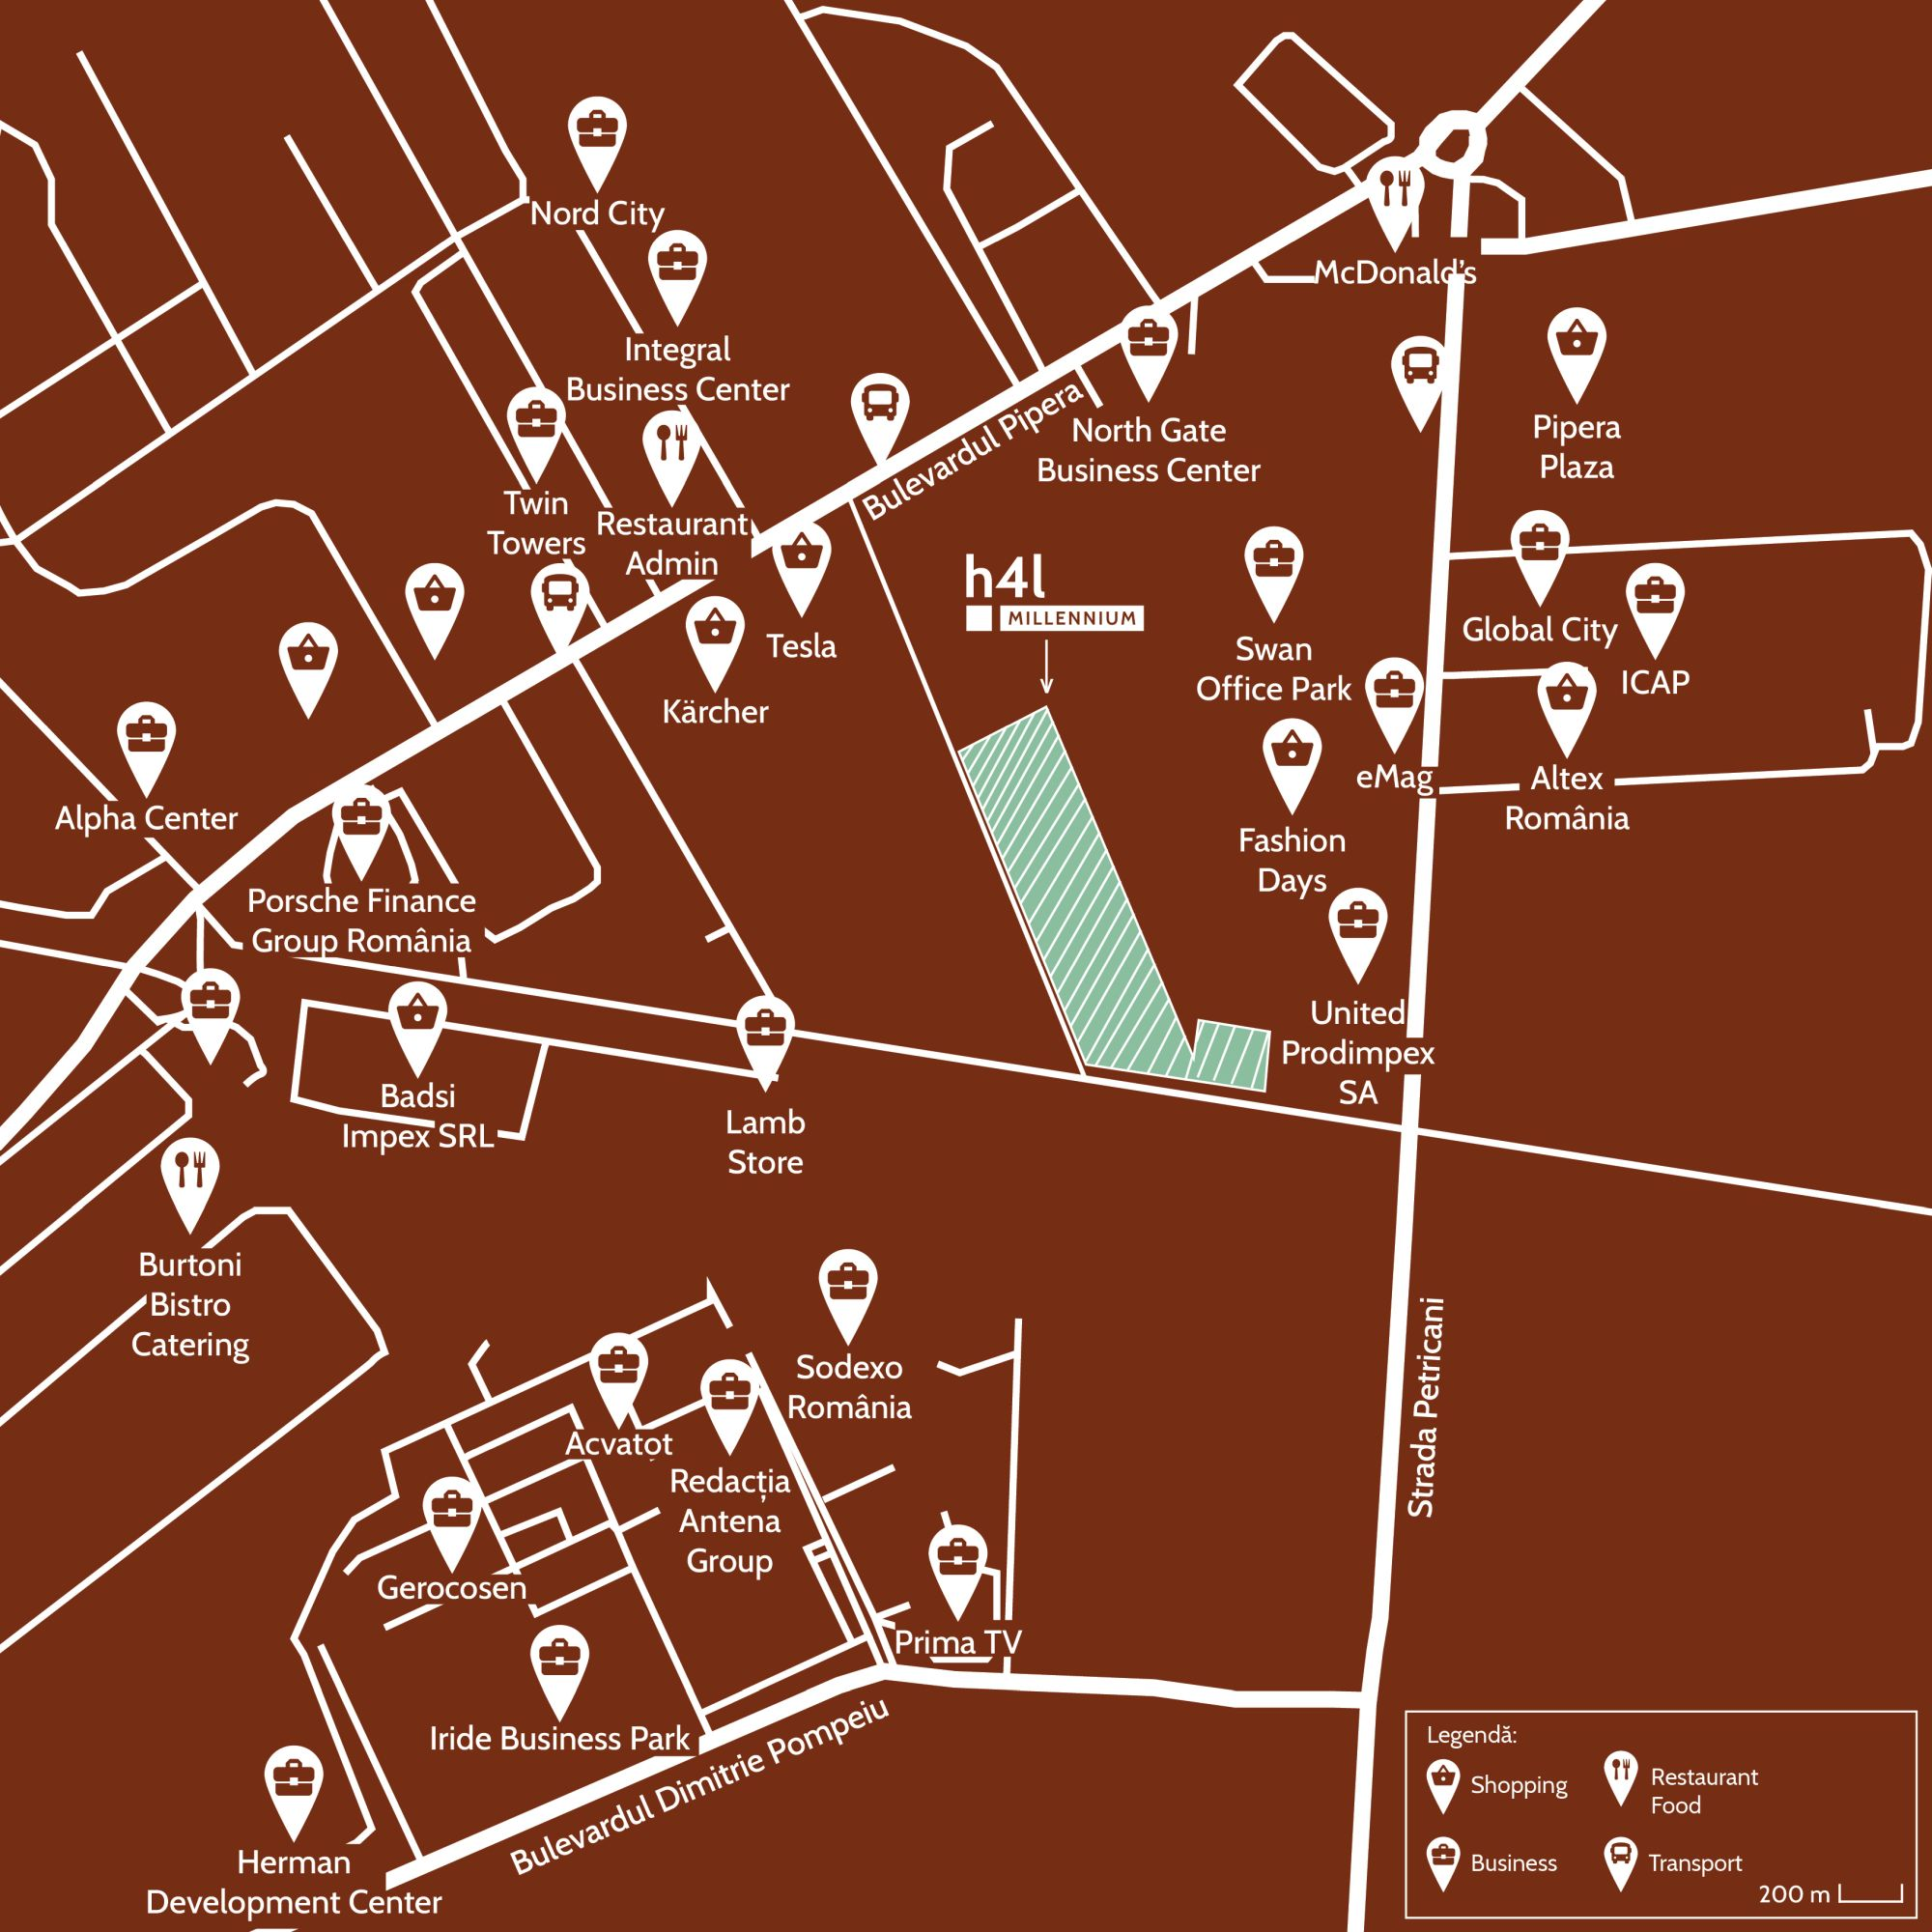 h4l MILLENNIUM pin map